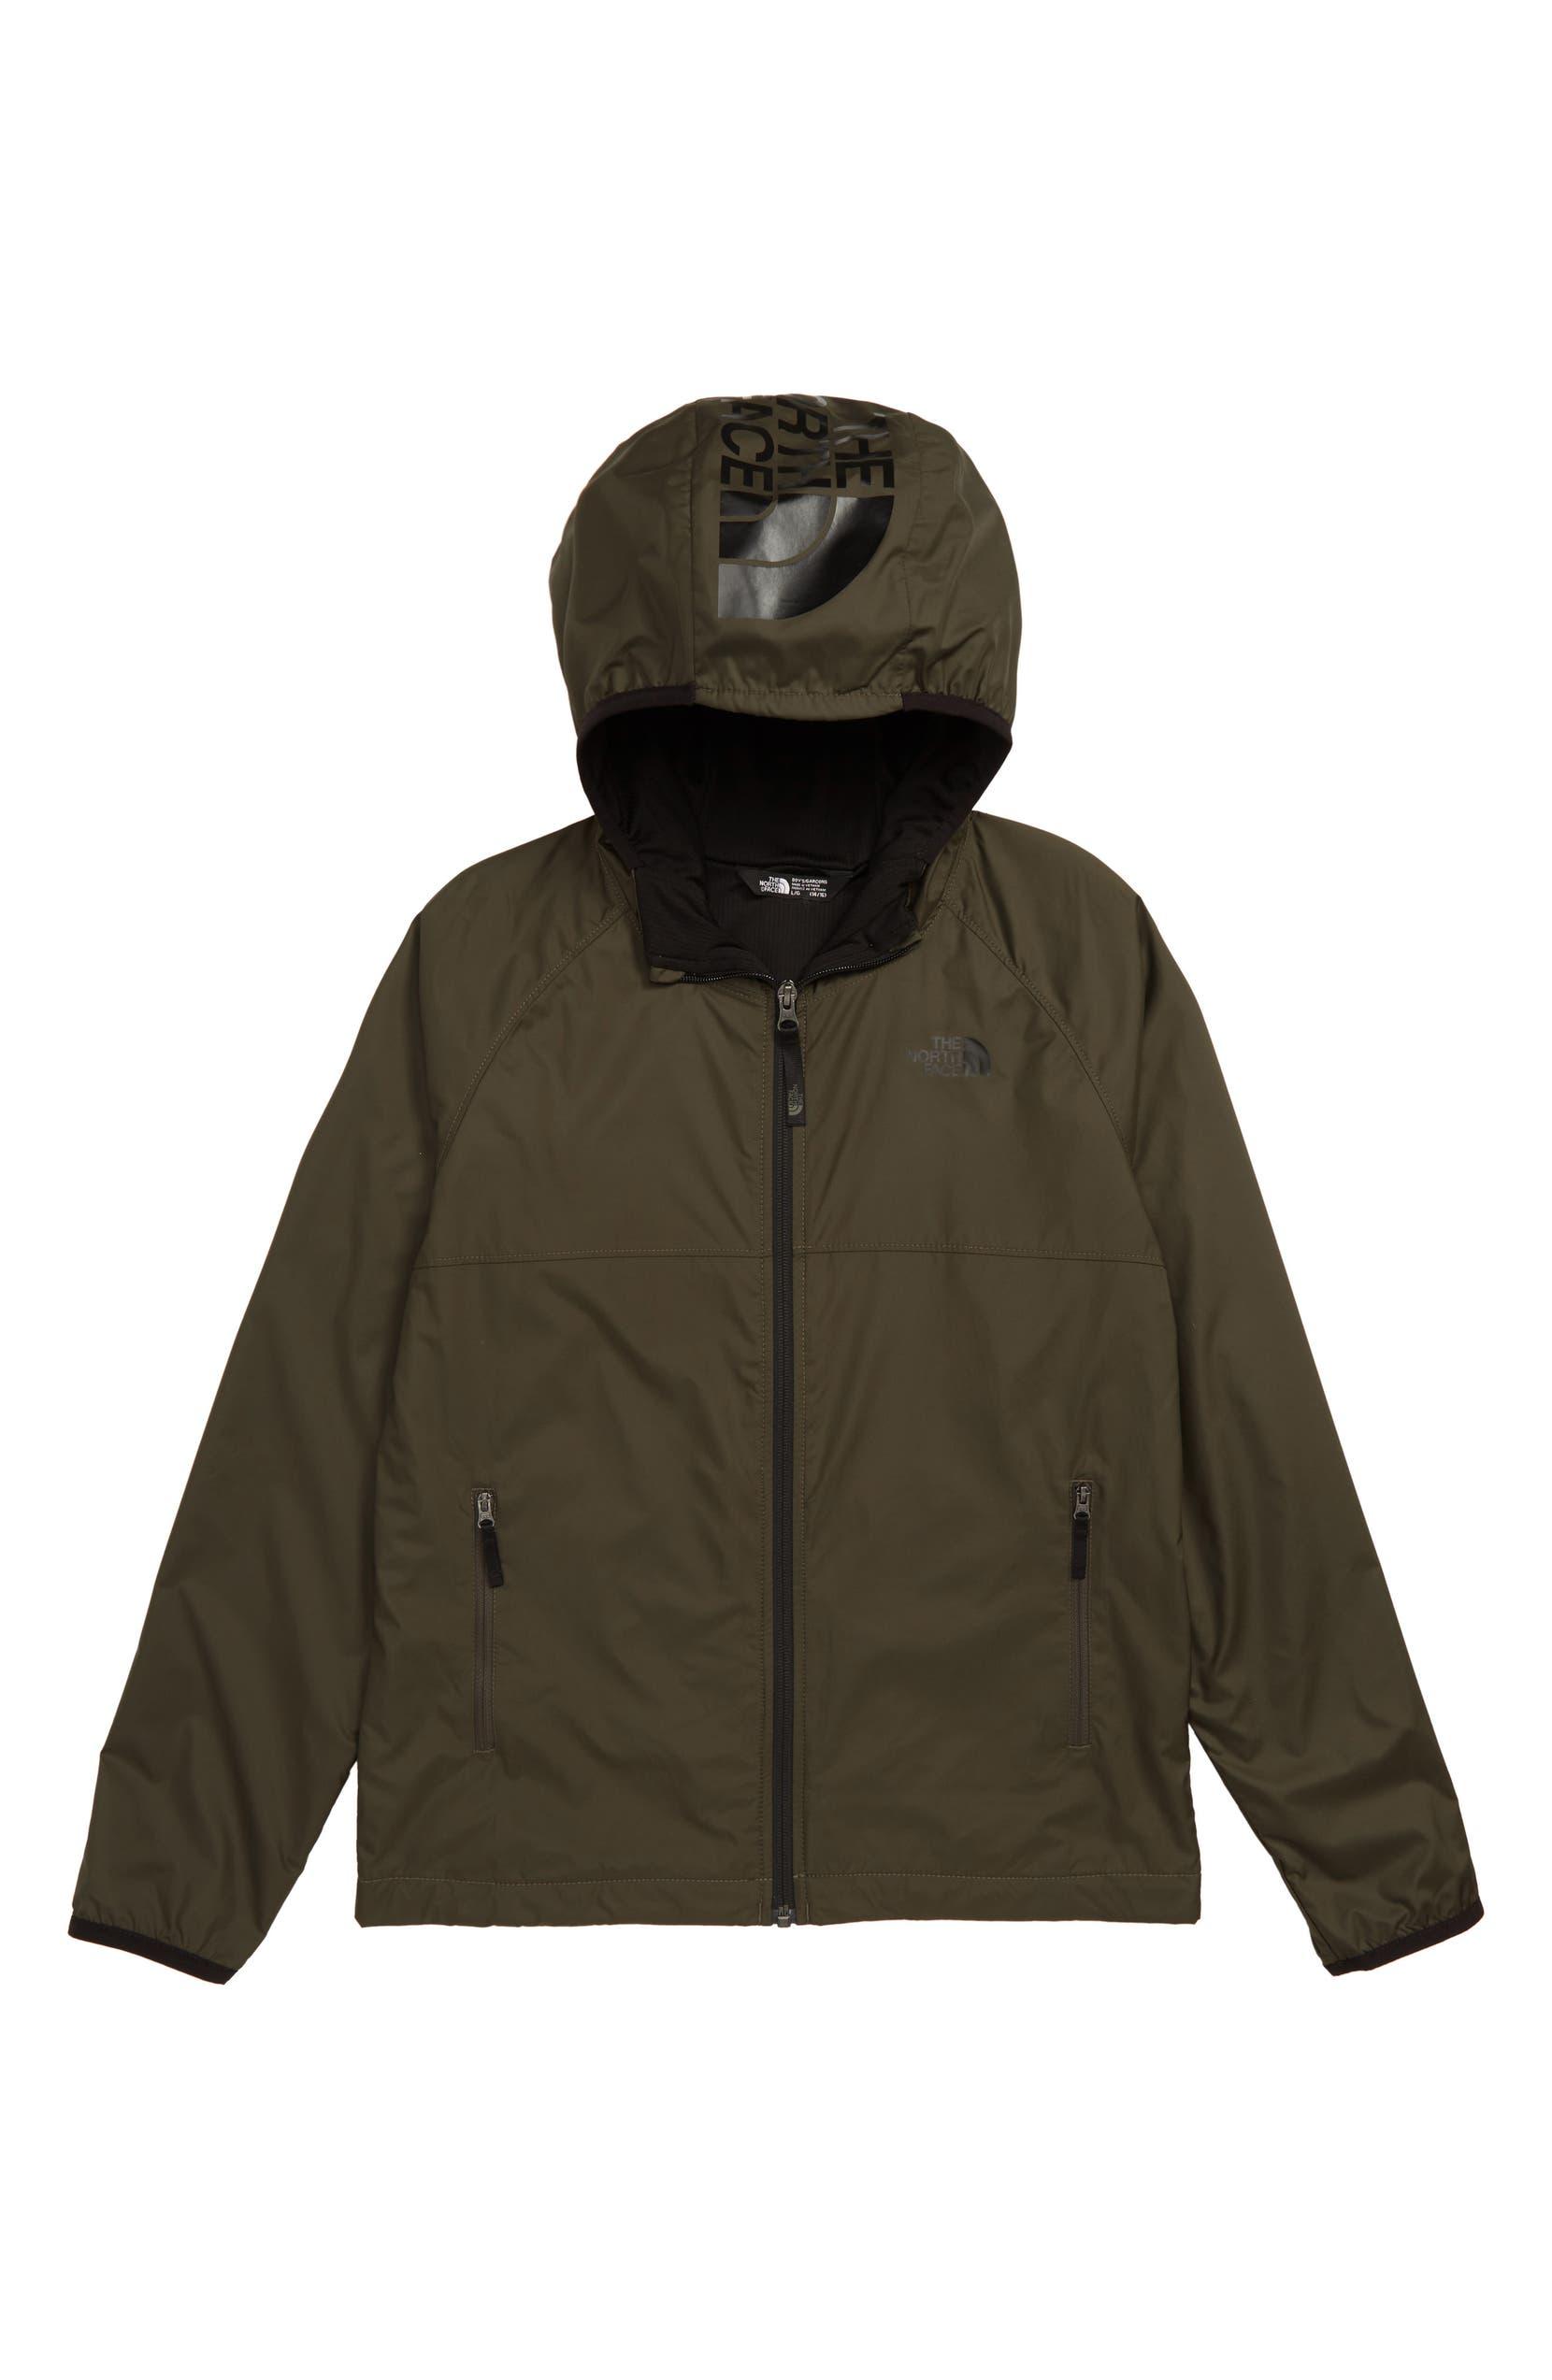 7f9773995 Windy Crest Water Repellent Jacket